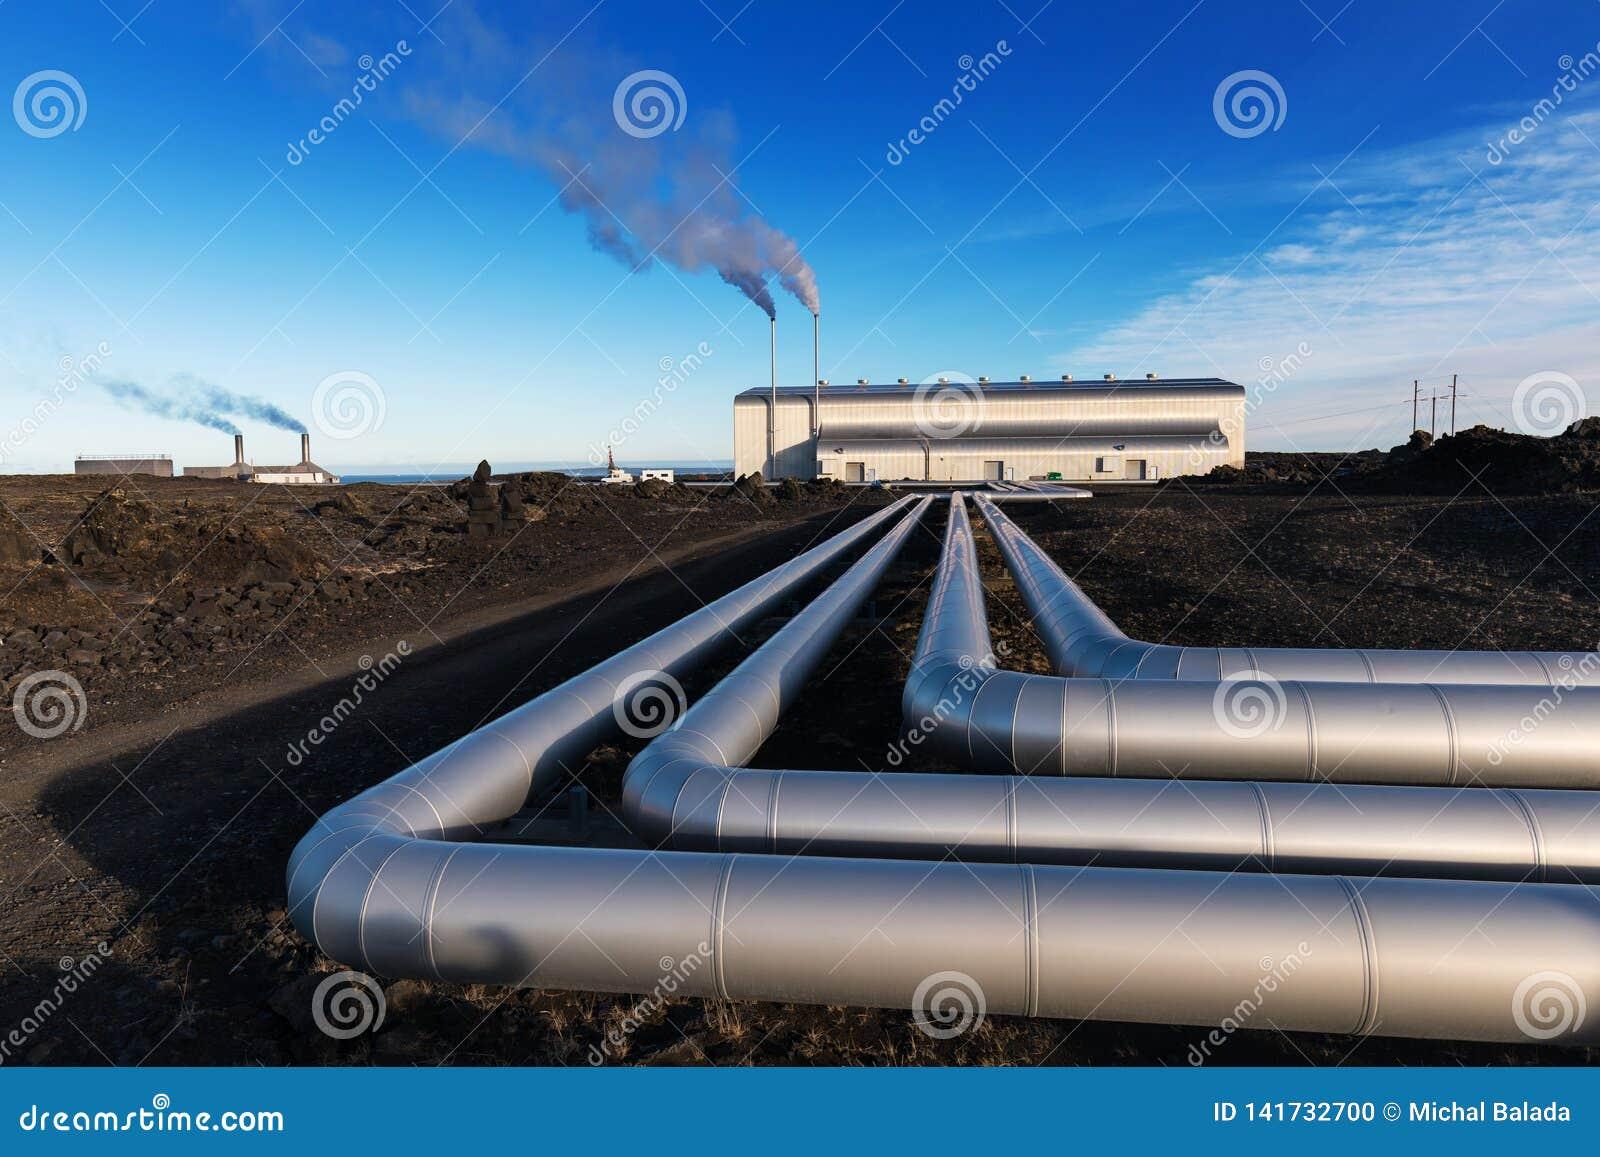 Environmental Heat Energy Station On The Underground Hot